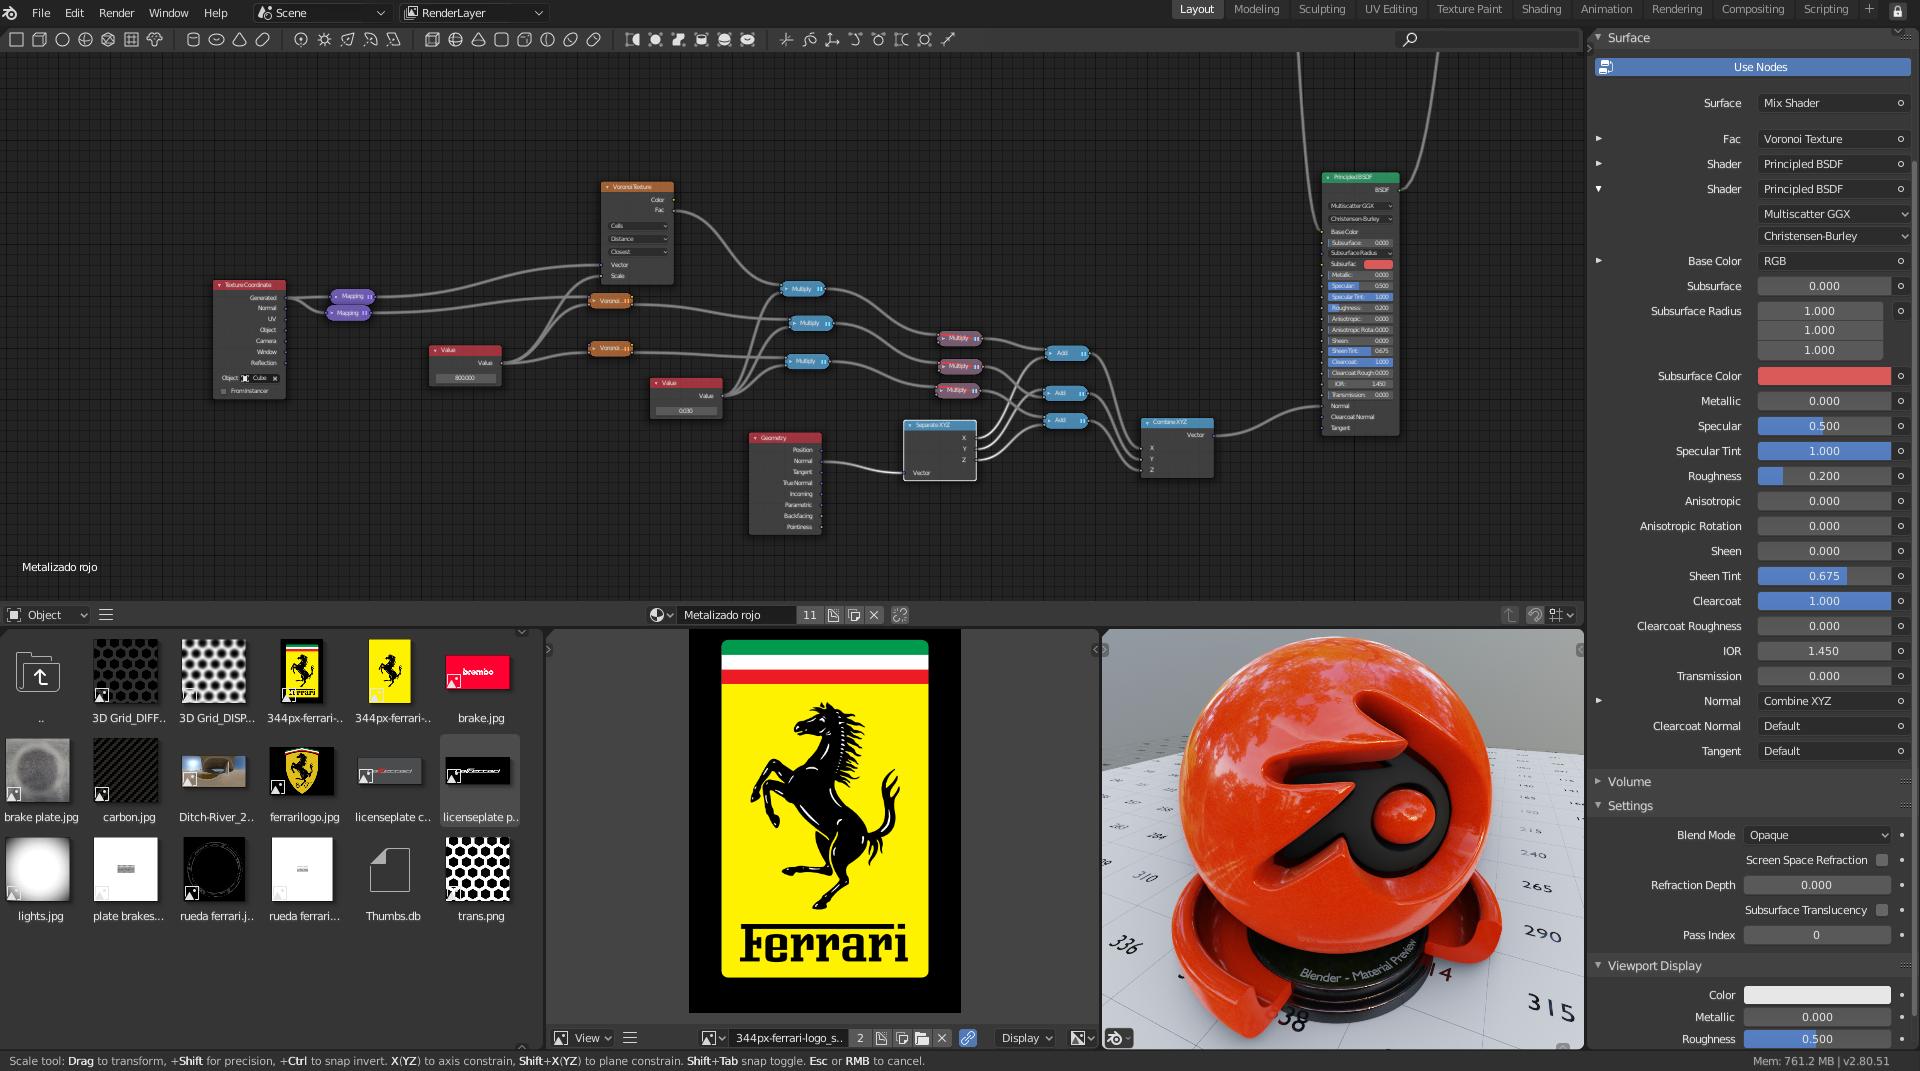 Blender 2 8 user interface design - User Feedback - Blender